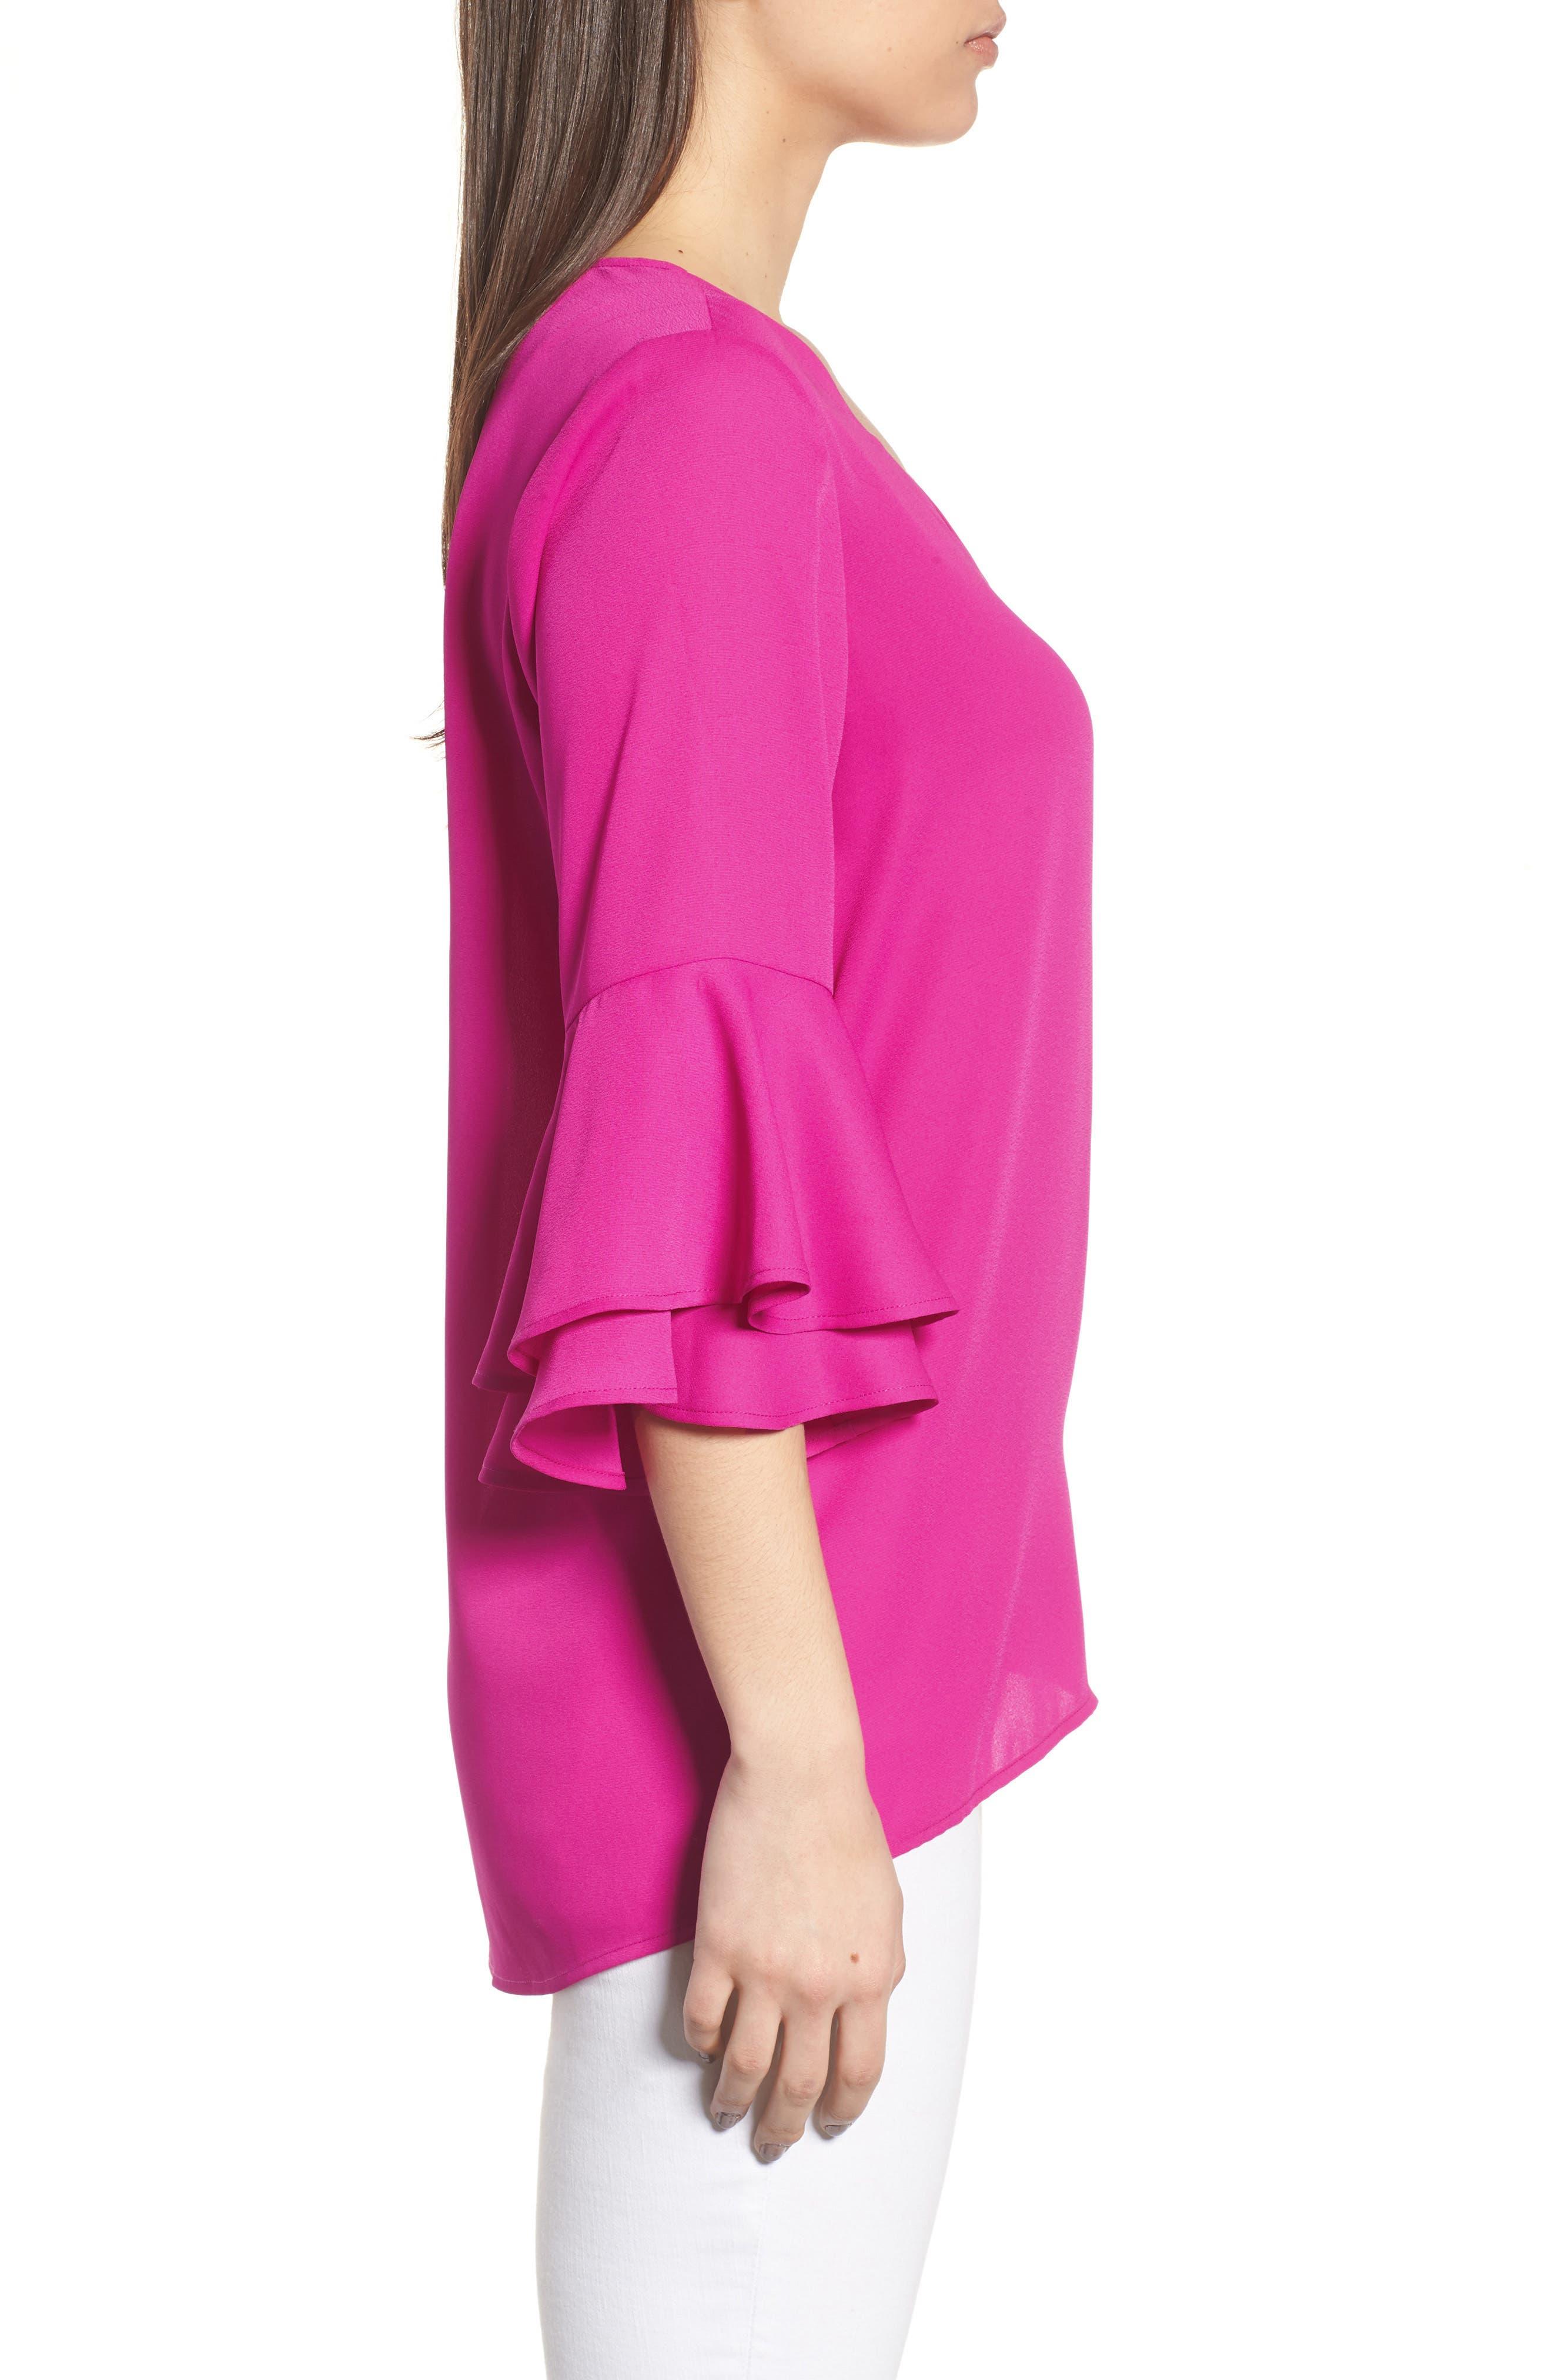 Ruffle Sleeve V-Neck Blouse,                             Alternate thumbnail 3, color,                             686-Pink Nouveau